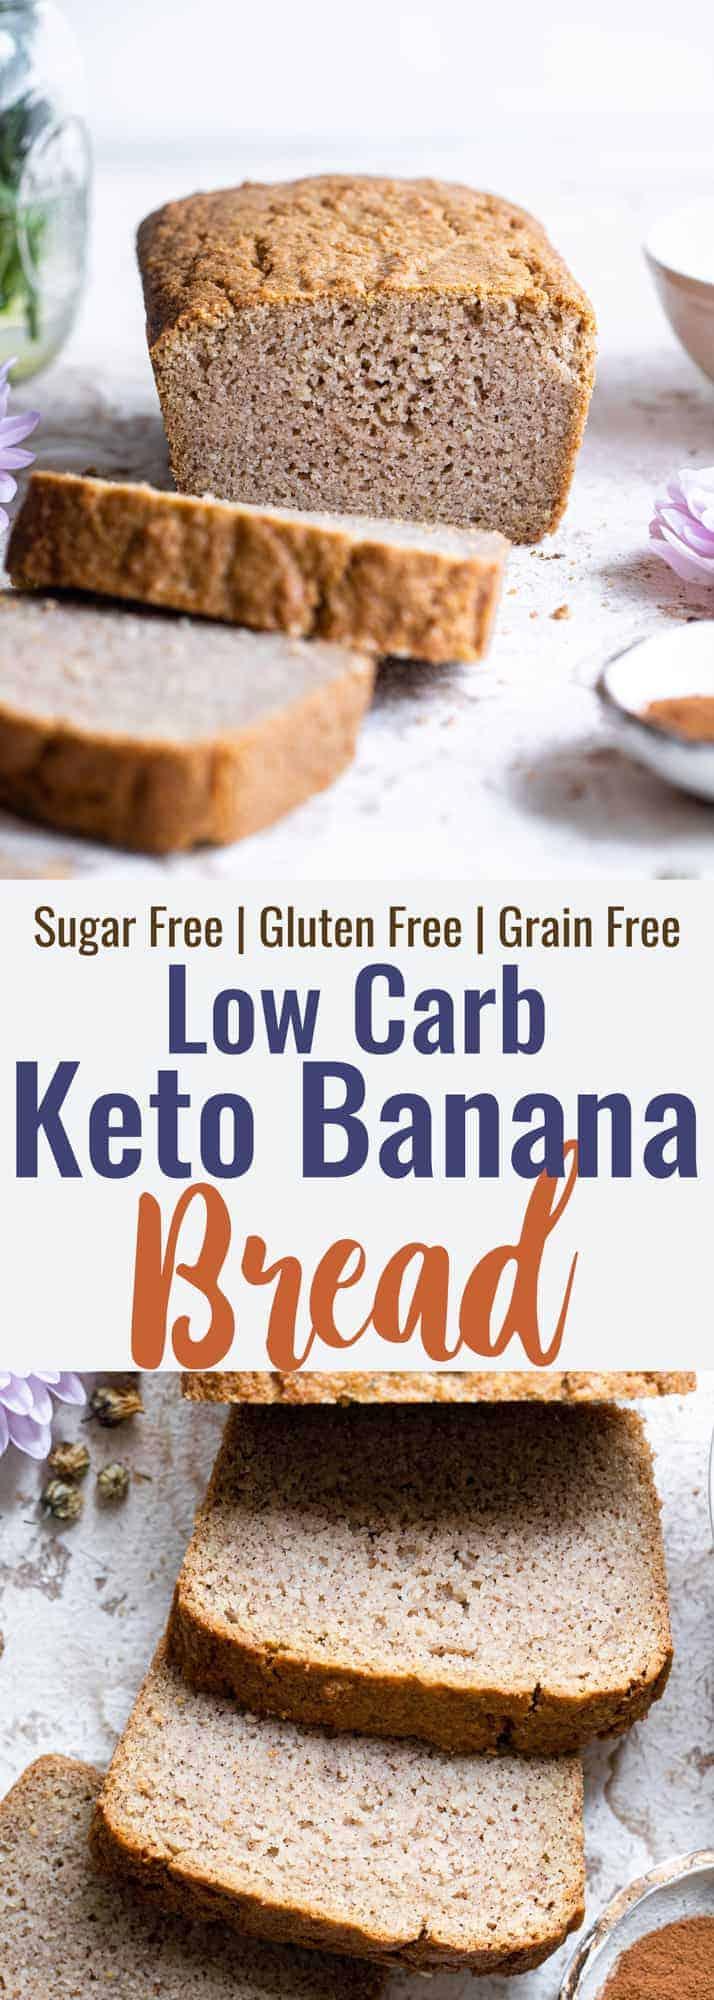 low carb keto banana bread pic nocompress